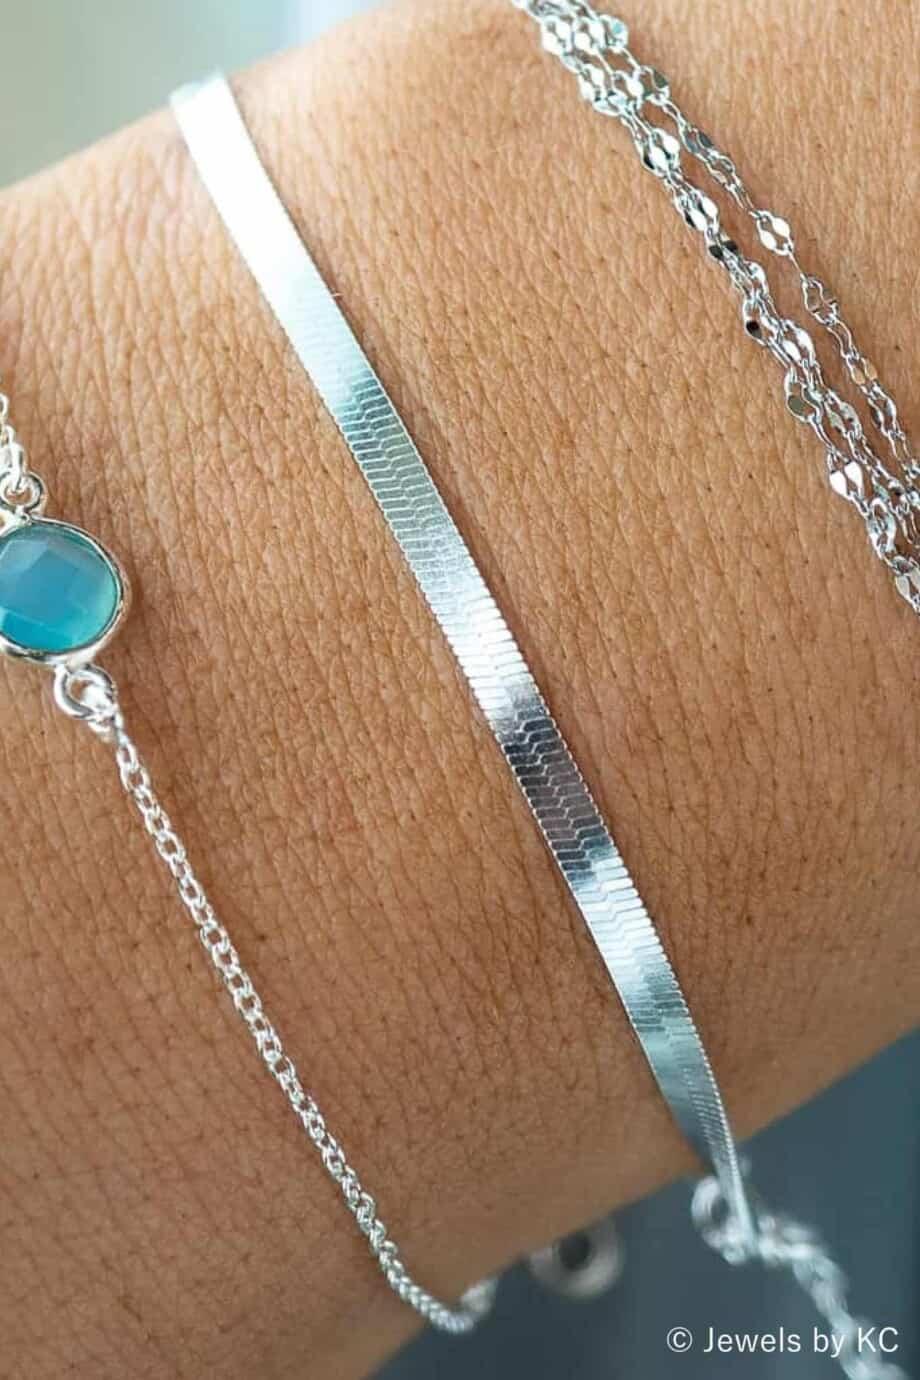 Zilveren Armband 'Flat snake' Snake chain armband van Sterling Zilver